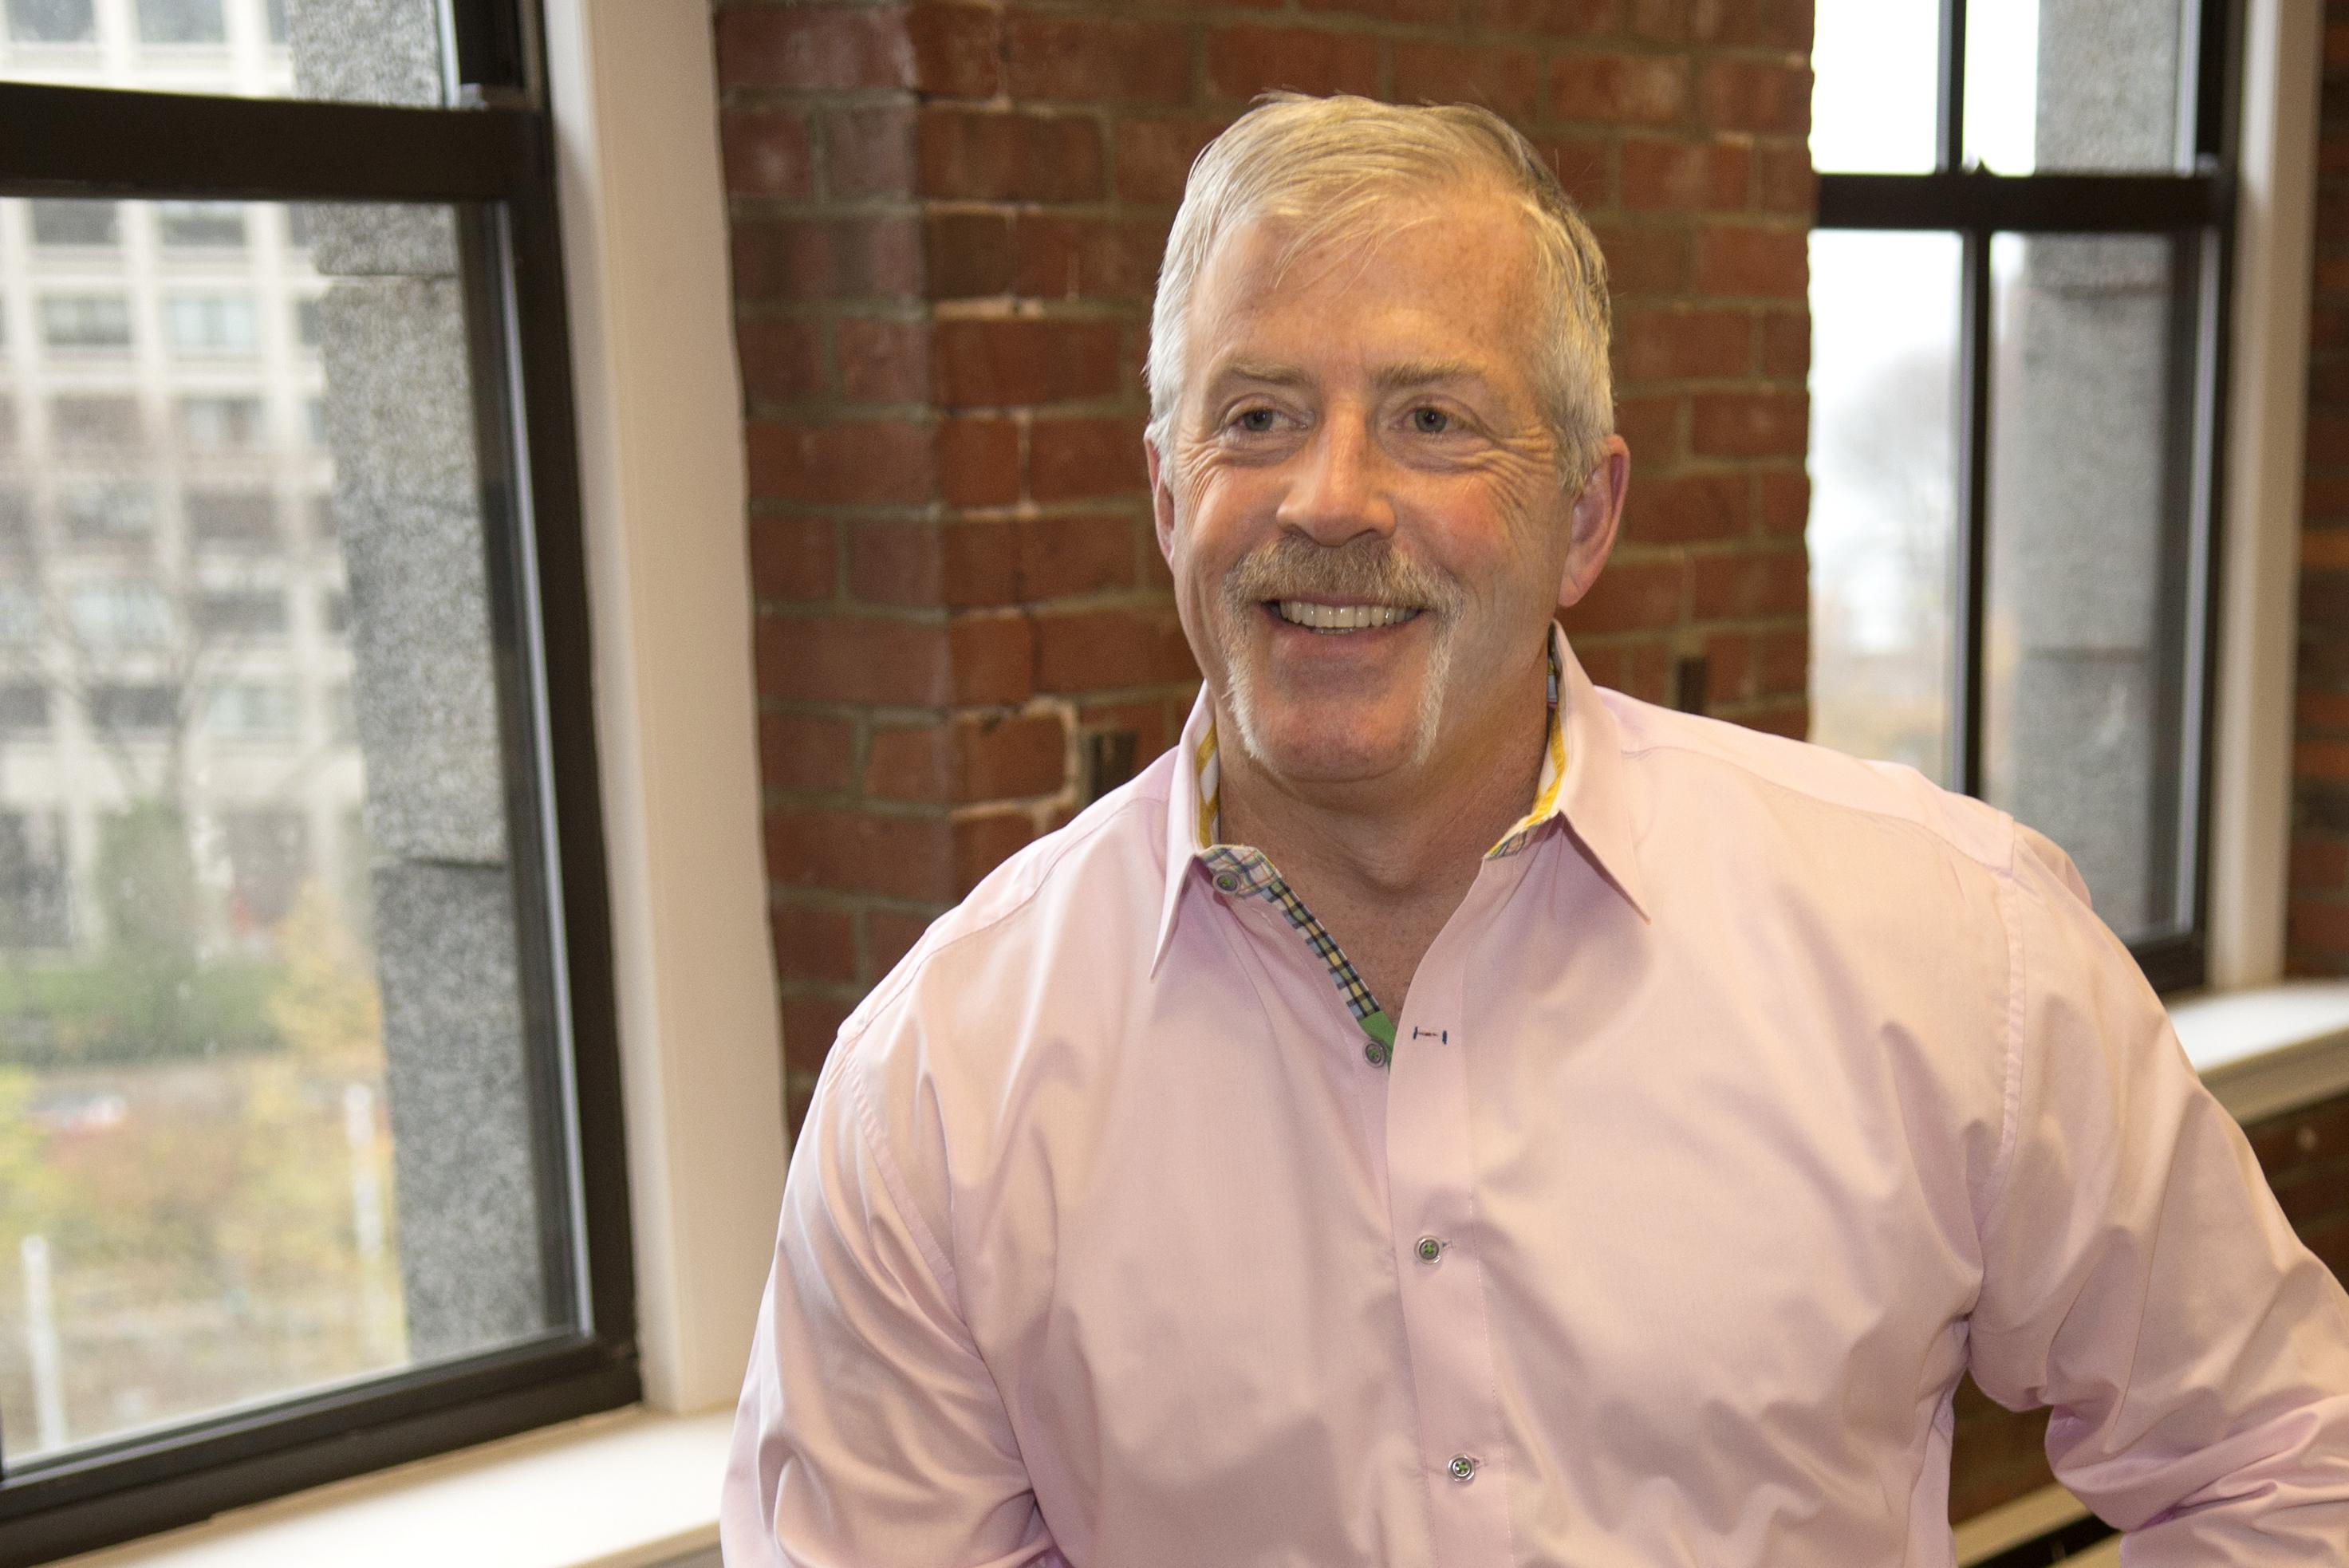 Jack Danahy, CTO and co-founder of Barkly, headshot